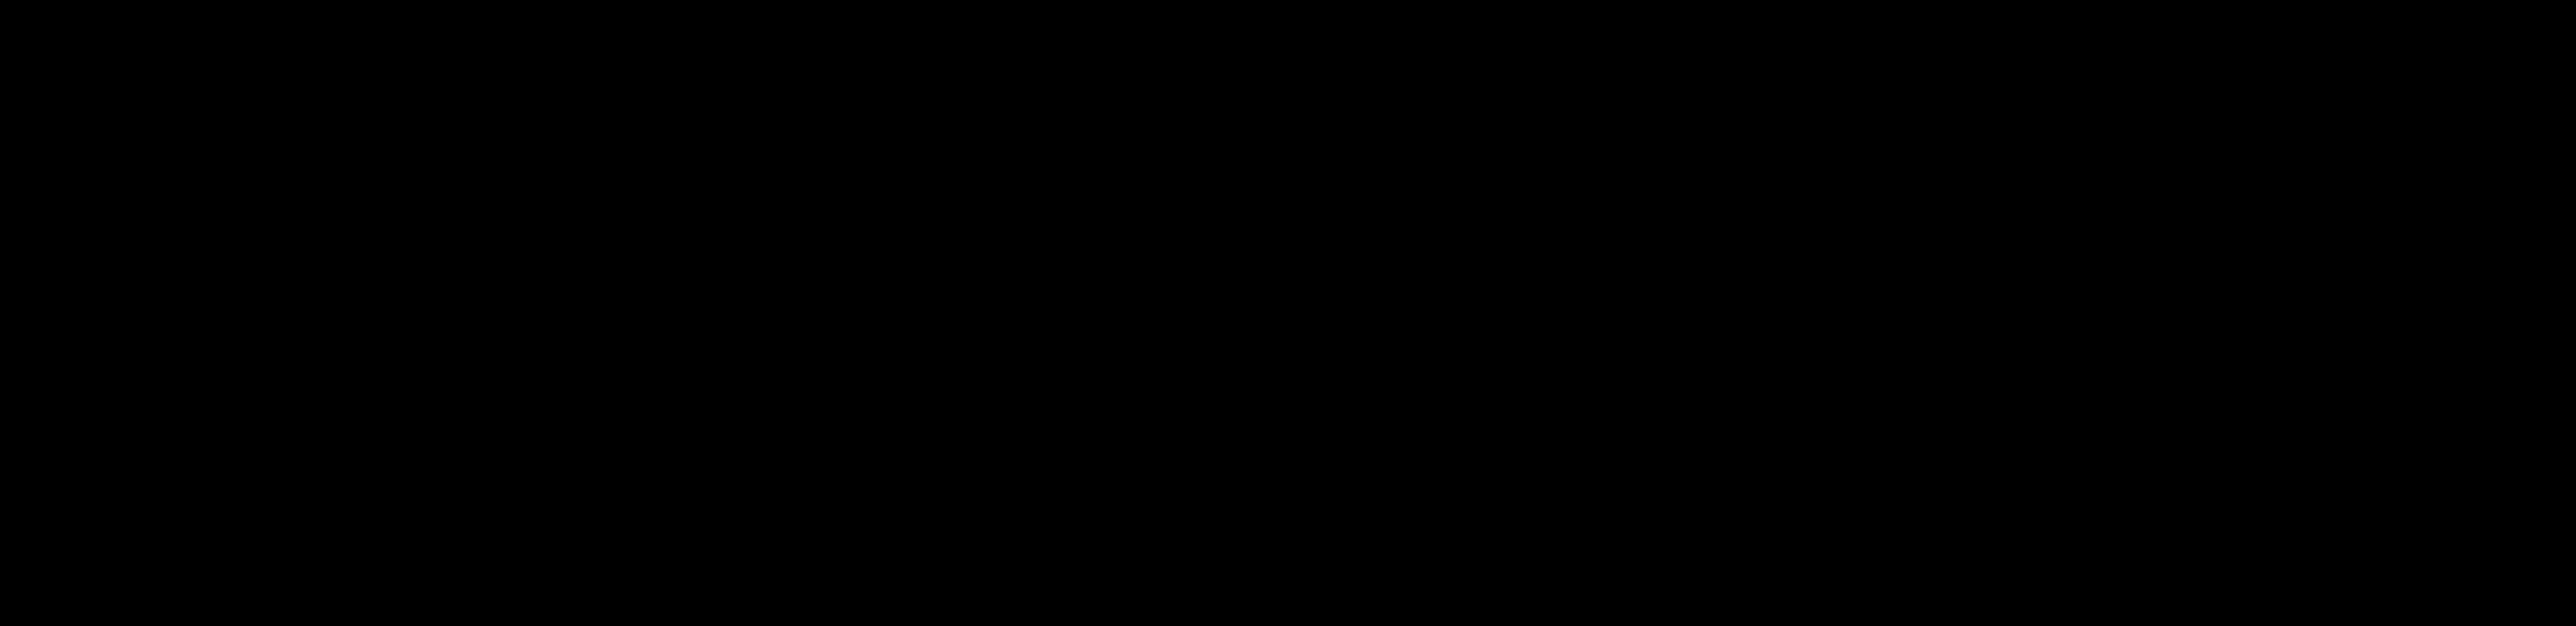 protocol3x